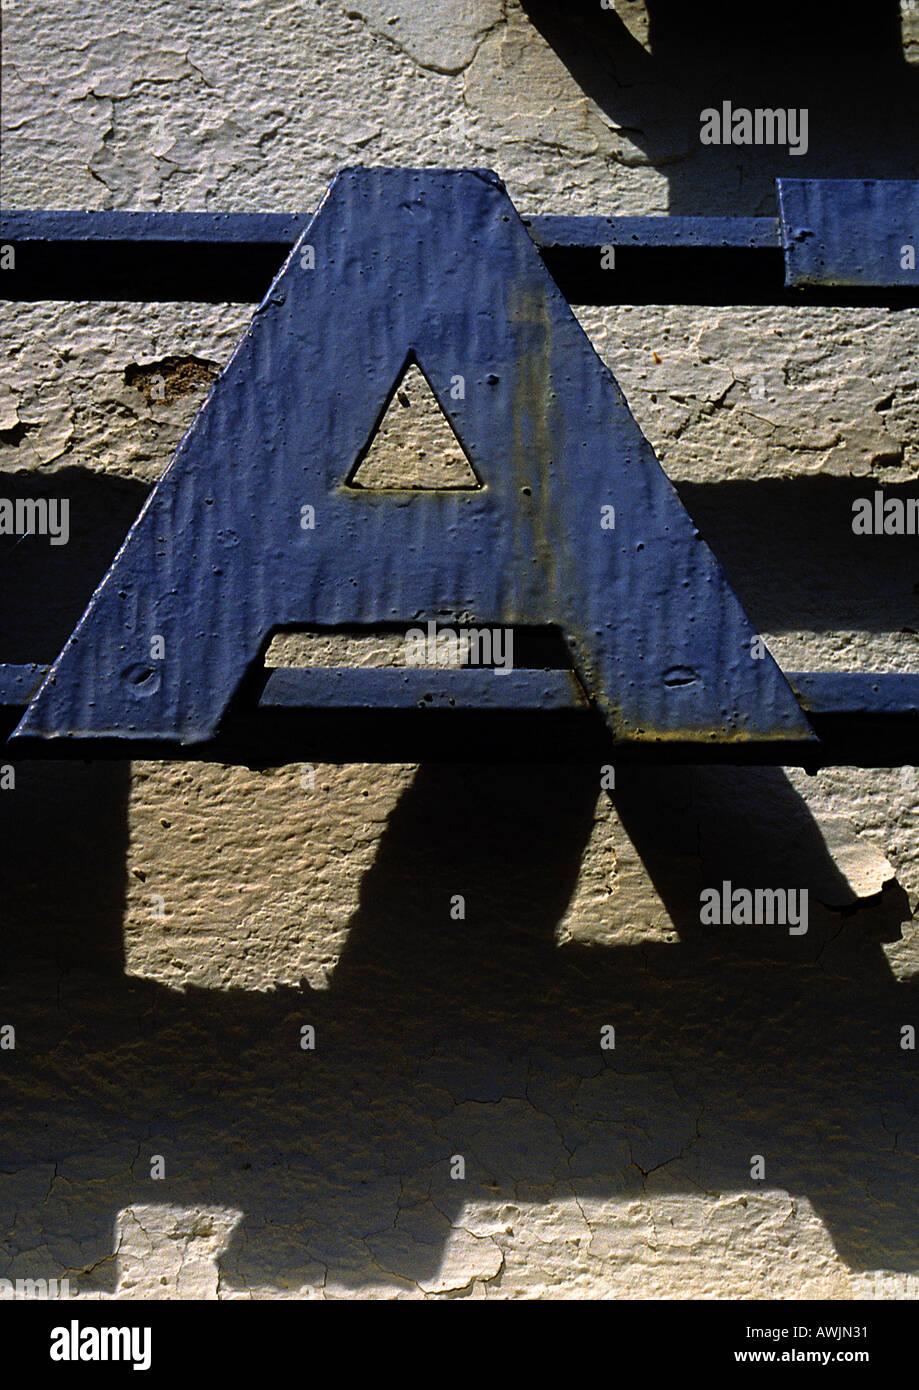 A, text, cutout. - Stock Image